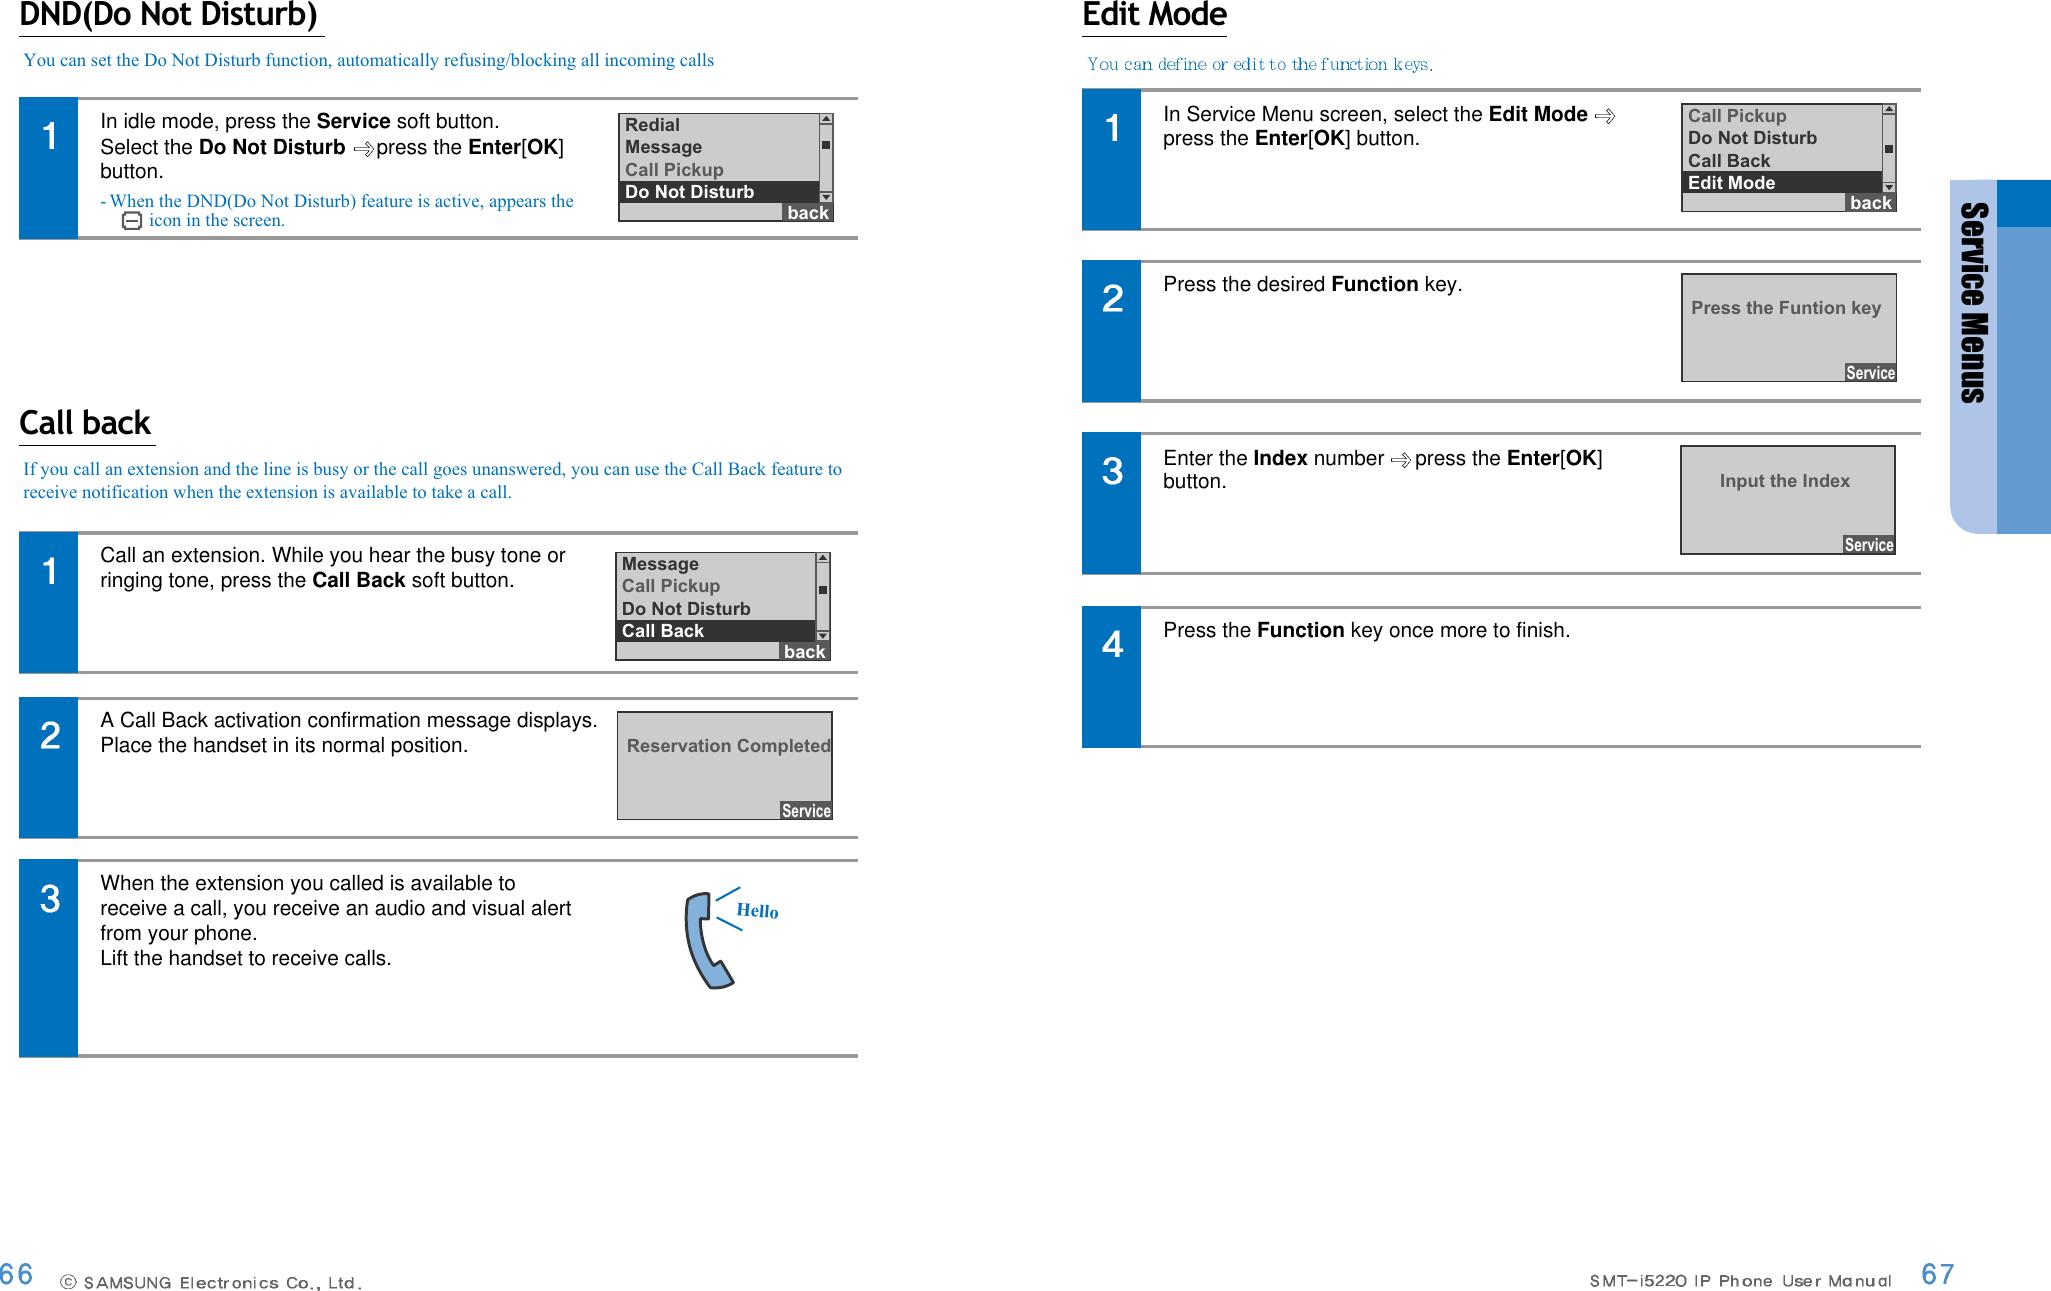 Samsung Ip Phone Smt I5220 Users Manual i5220Eng 0907 è